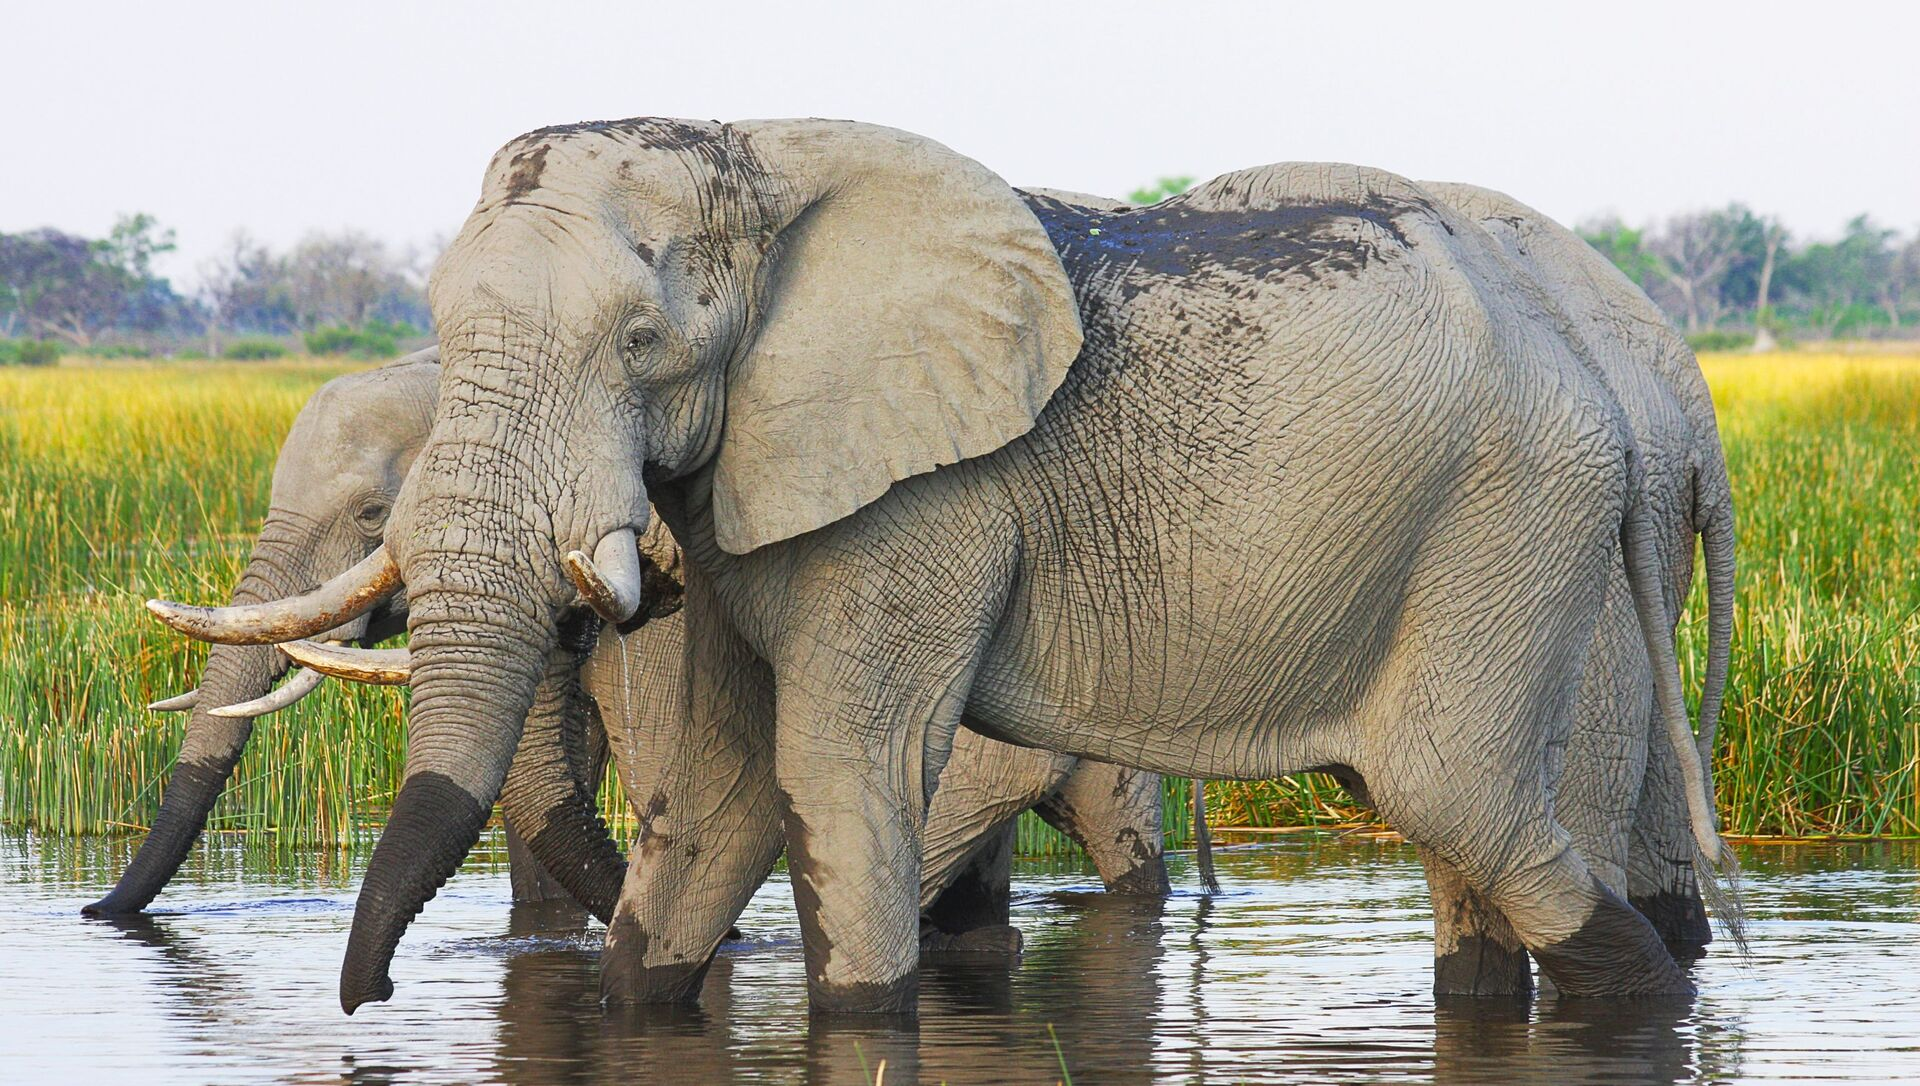 Elefanti africani - Sputnik Italia, 1920, 18.05.2021